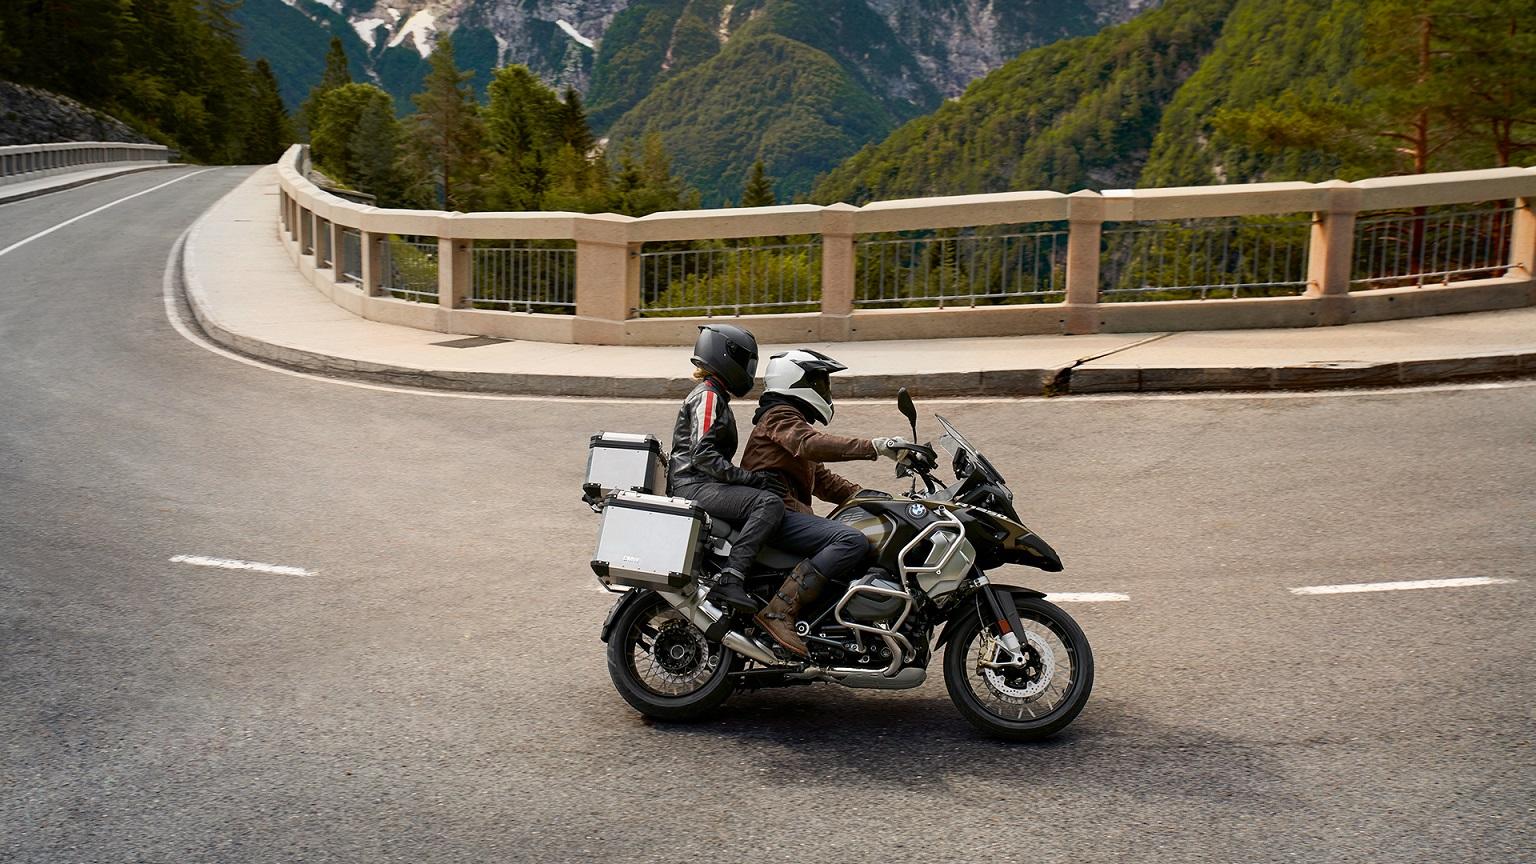 2020 BMW R 1250 GS Adventure Exterior Side Profile